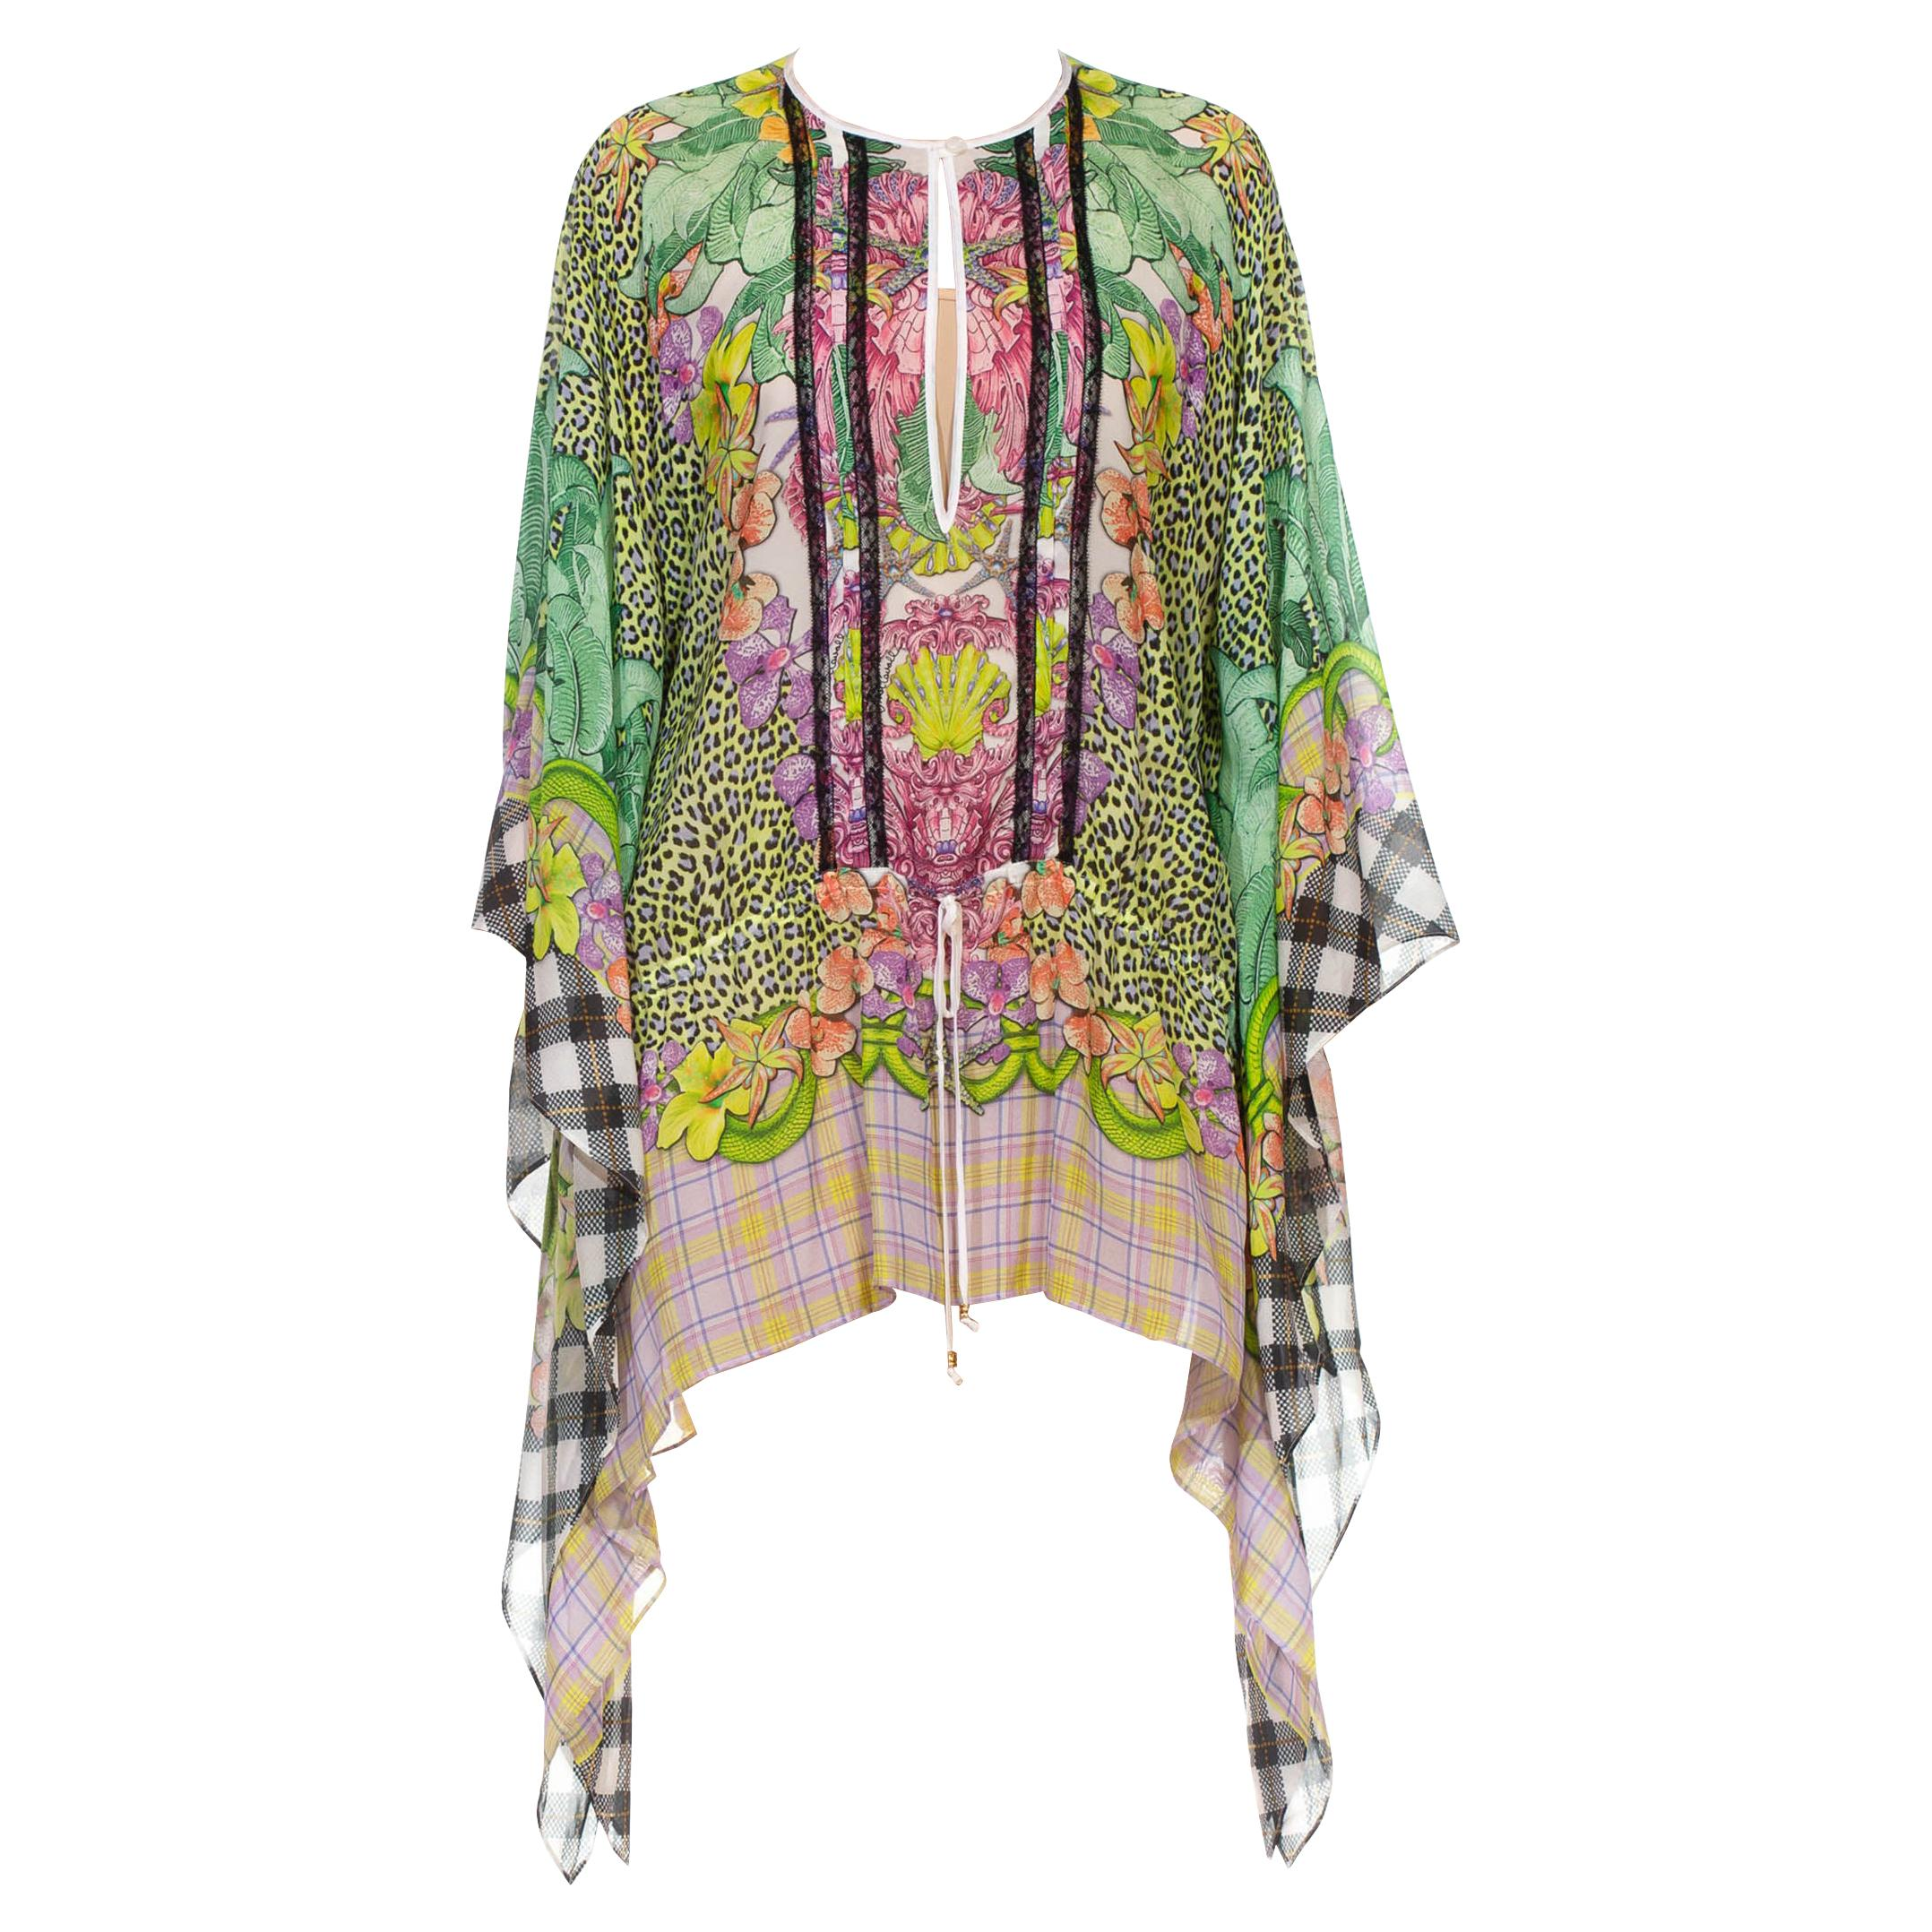 1990S CAVALLI Green & Pink Multicolored Silk Tunic Kaftan Top